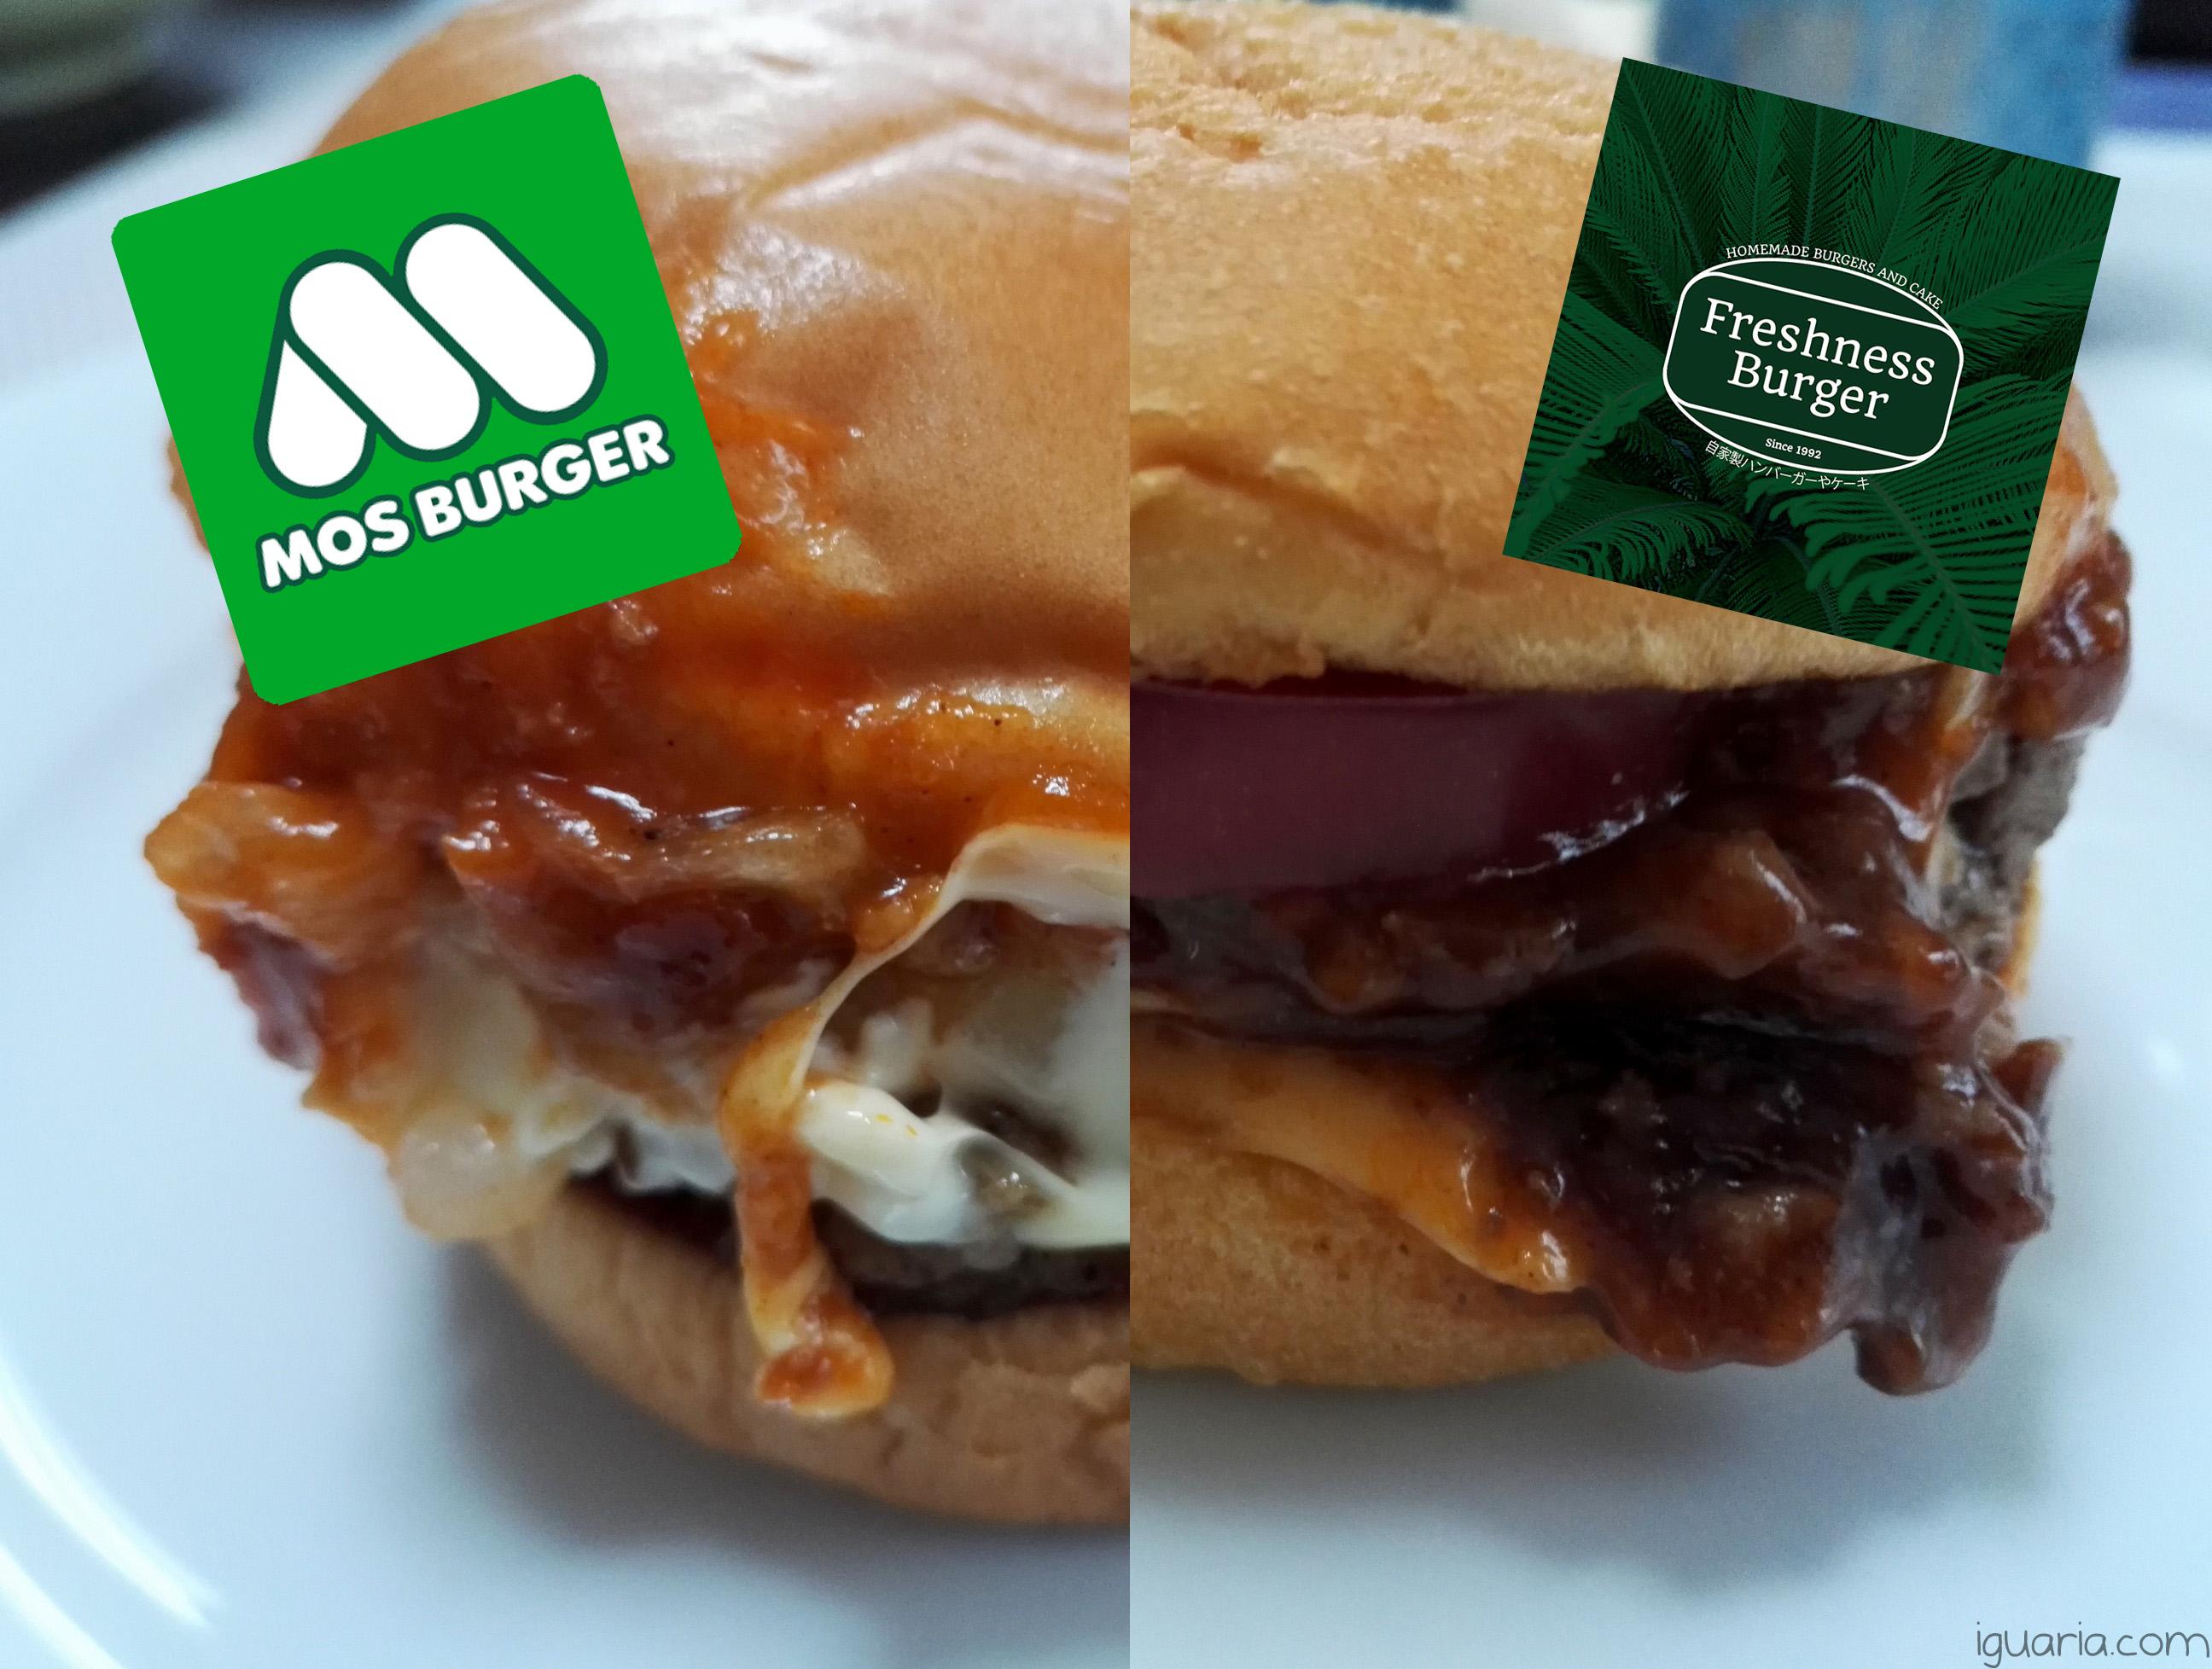 iguaria-mos-burger-vs-freshness-burger